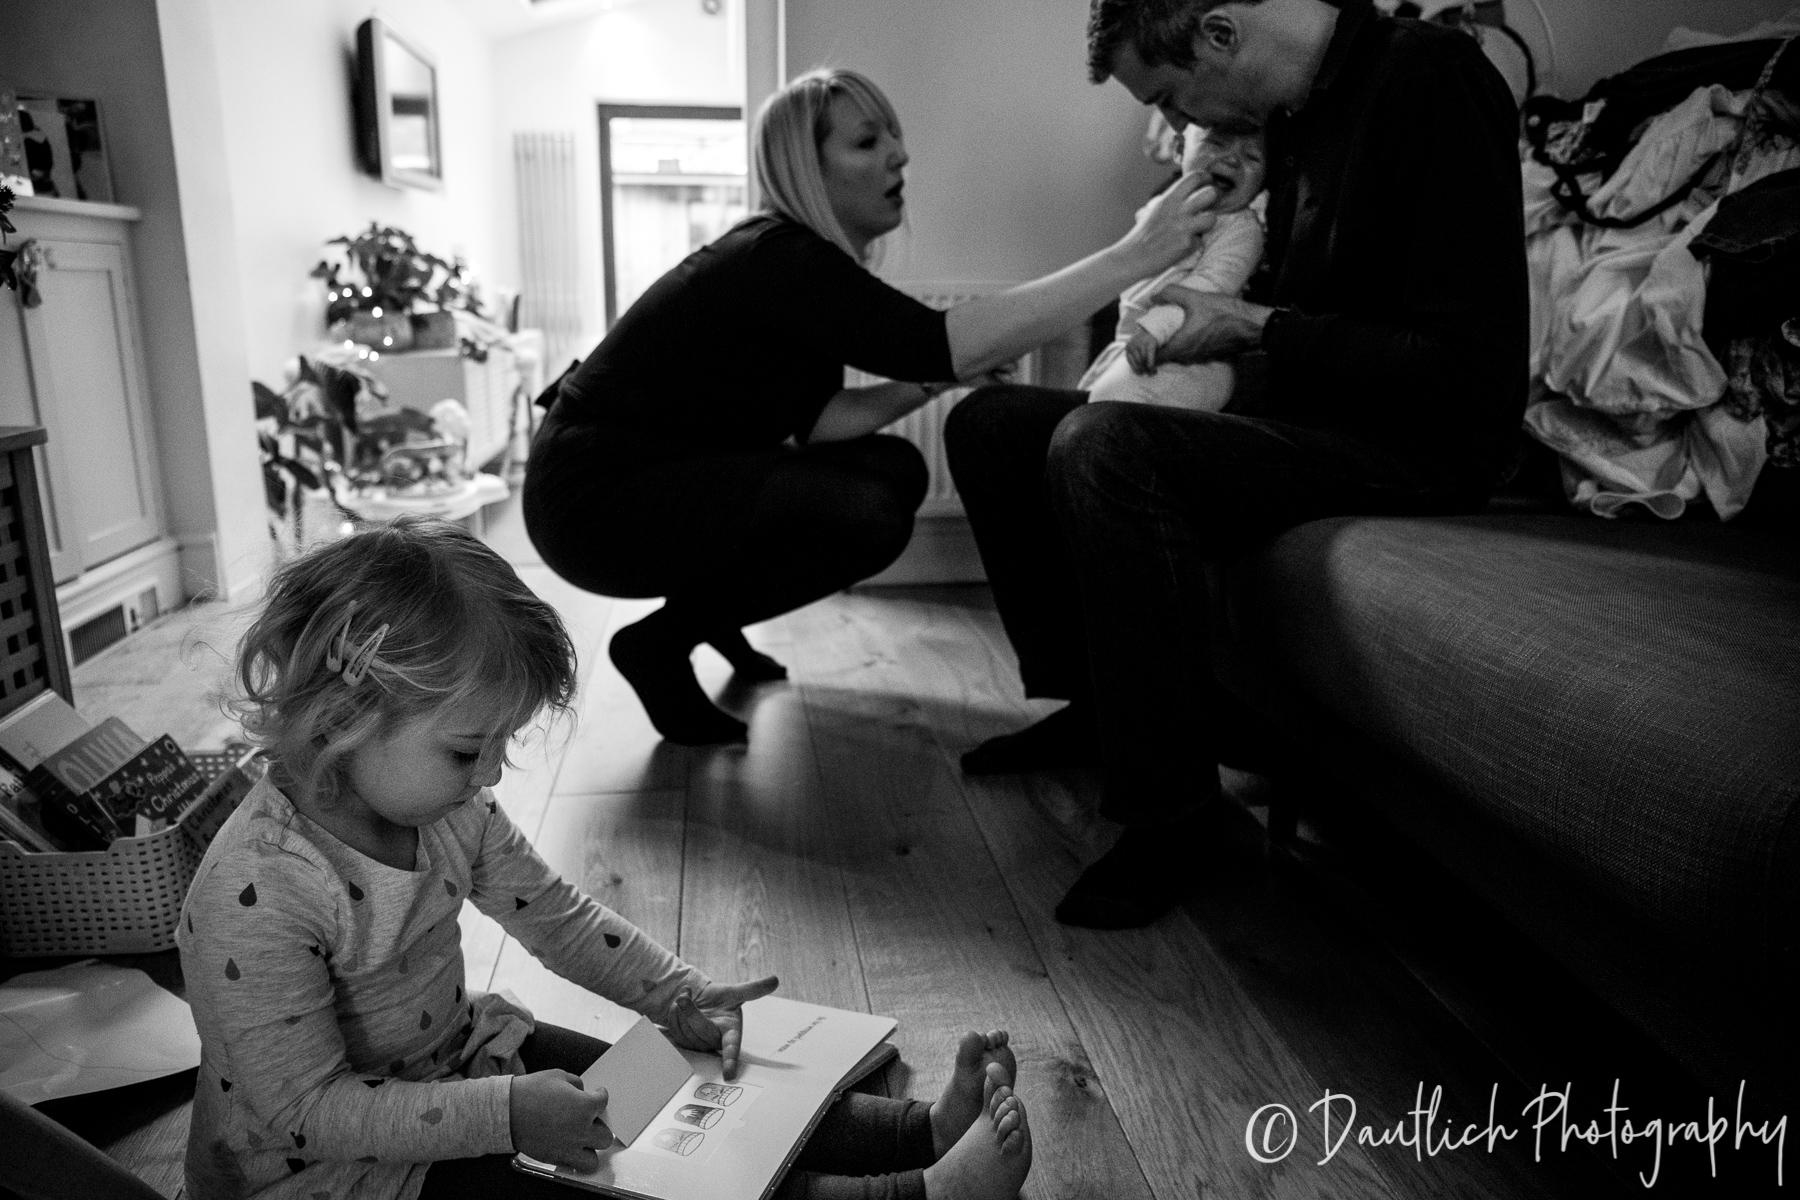 Dautlich_Photography_Apostolov_reedit-20.jpg